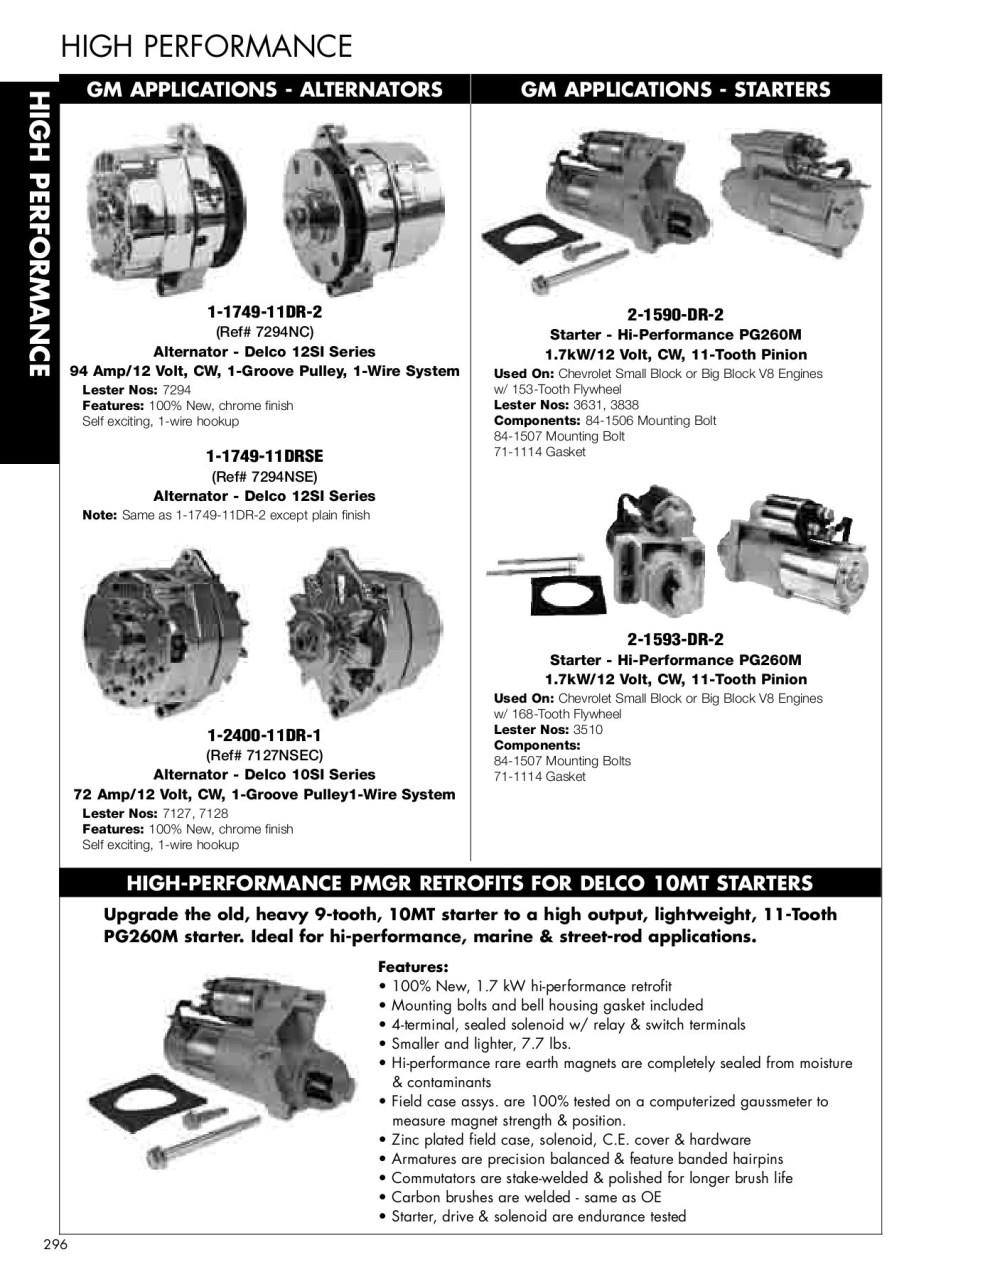 medium resolution of alternators starters generators motors domestic import pages 301 350 text version fliphtml5